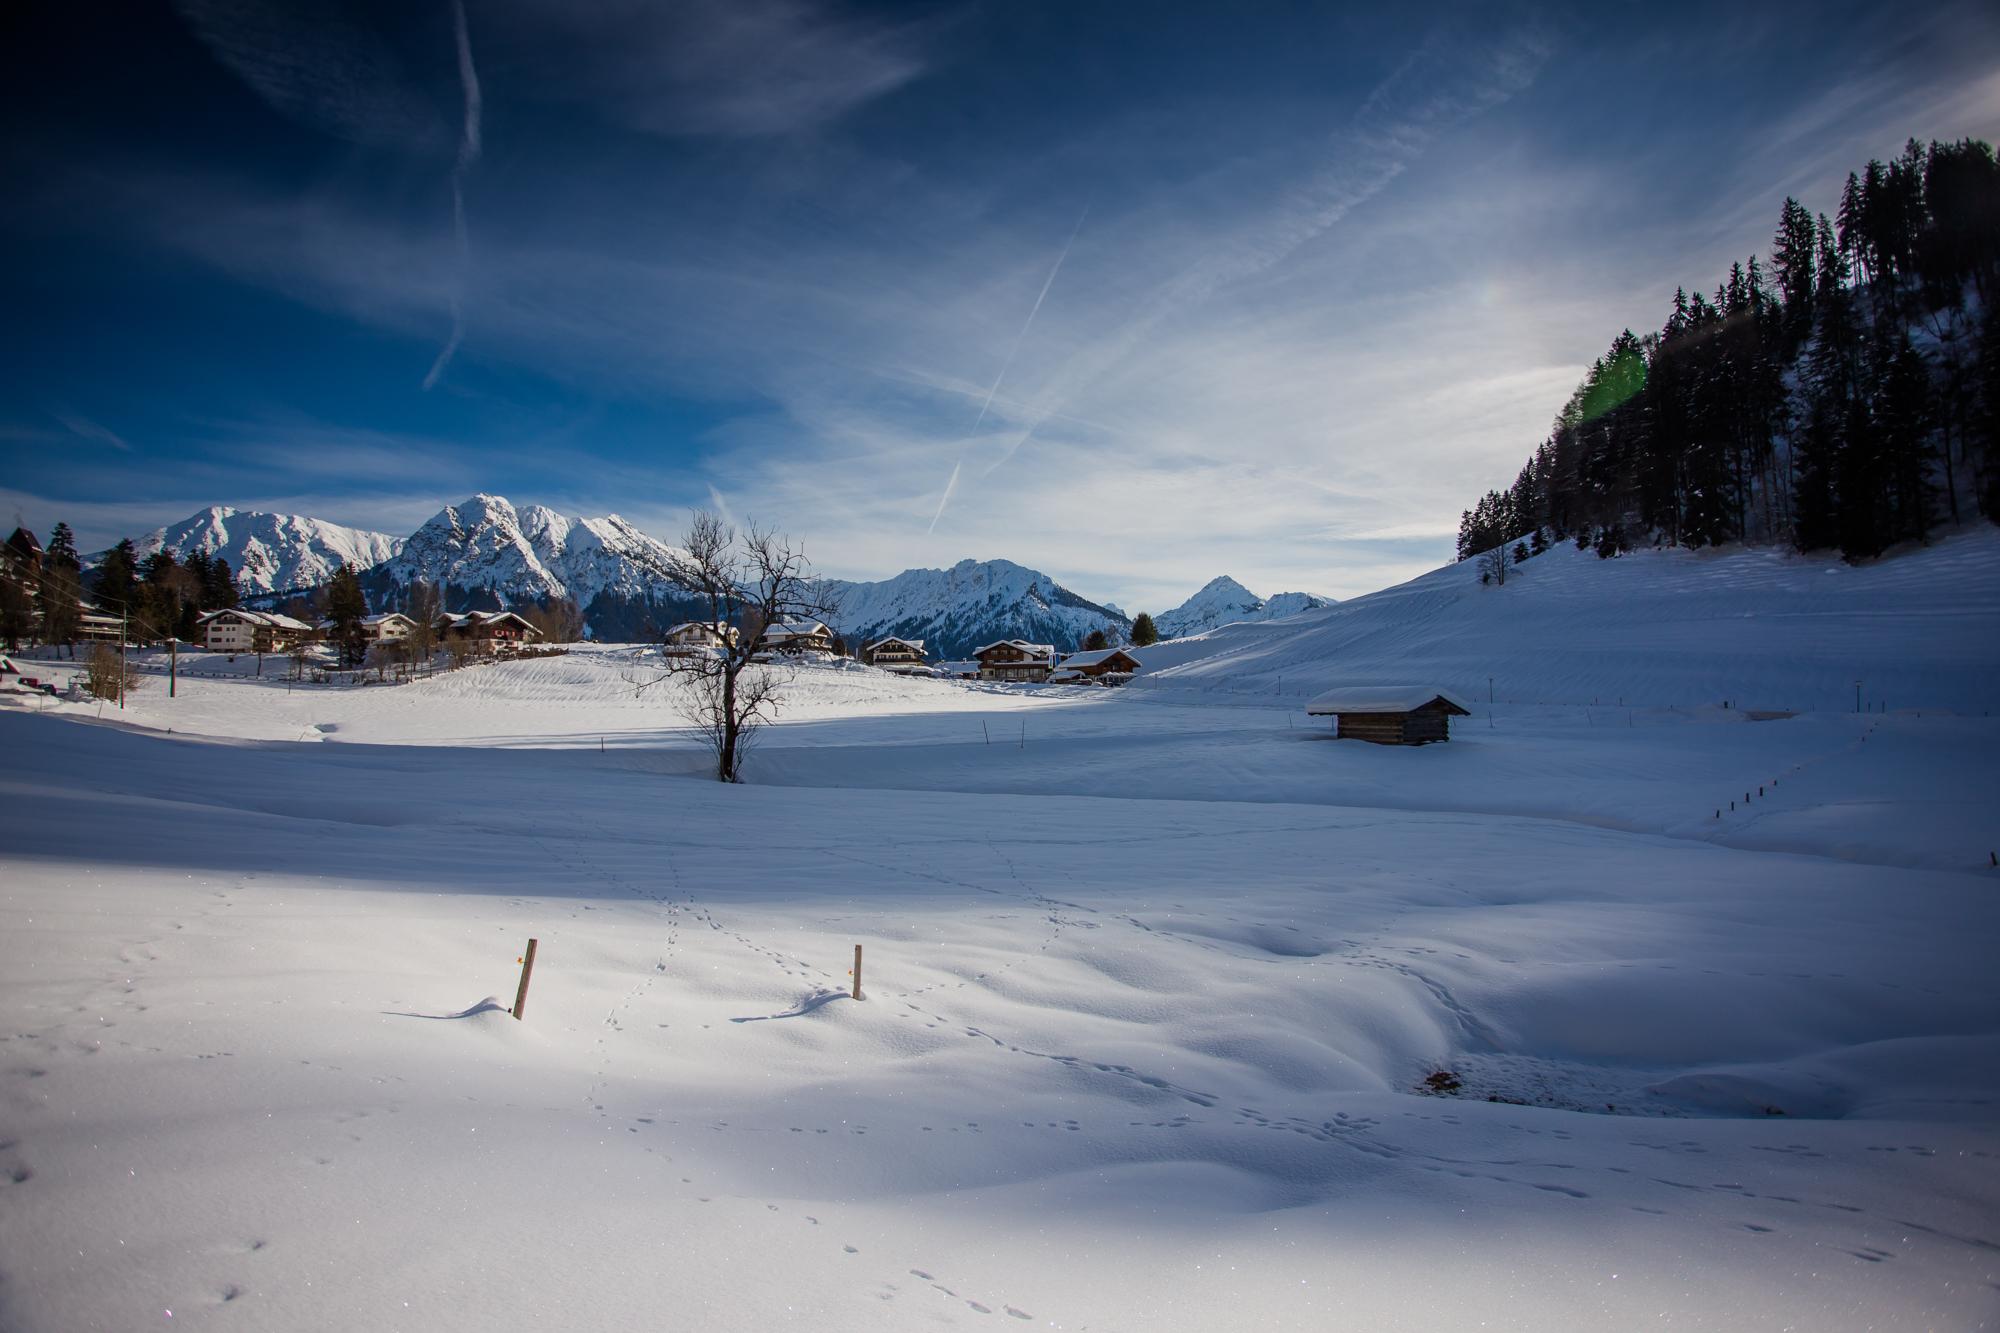 Bergruh Winter